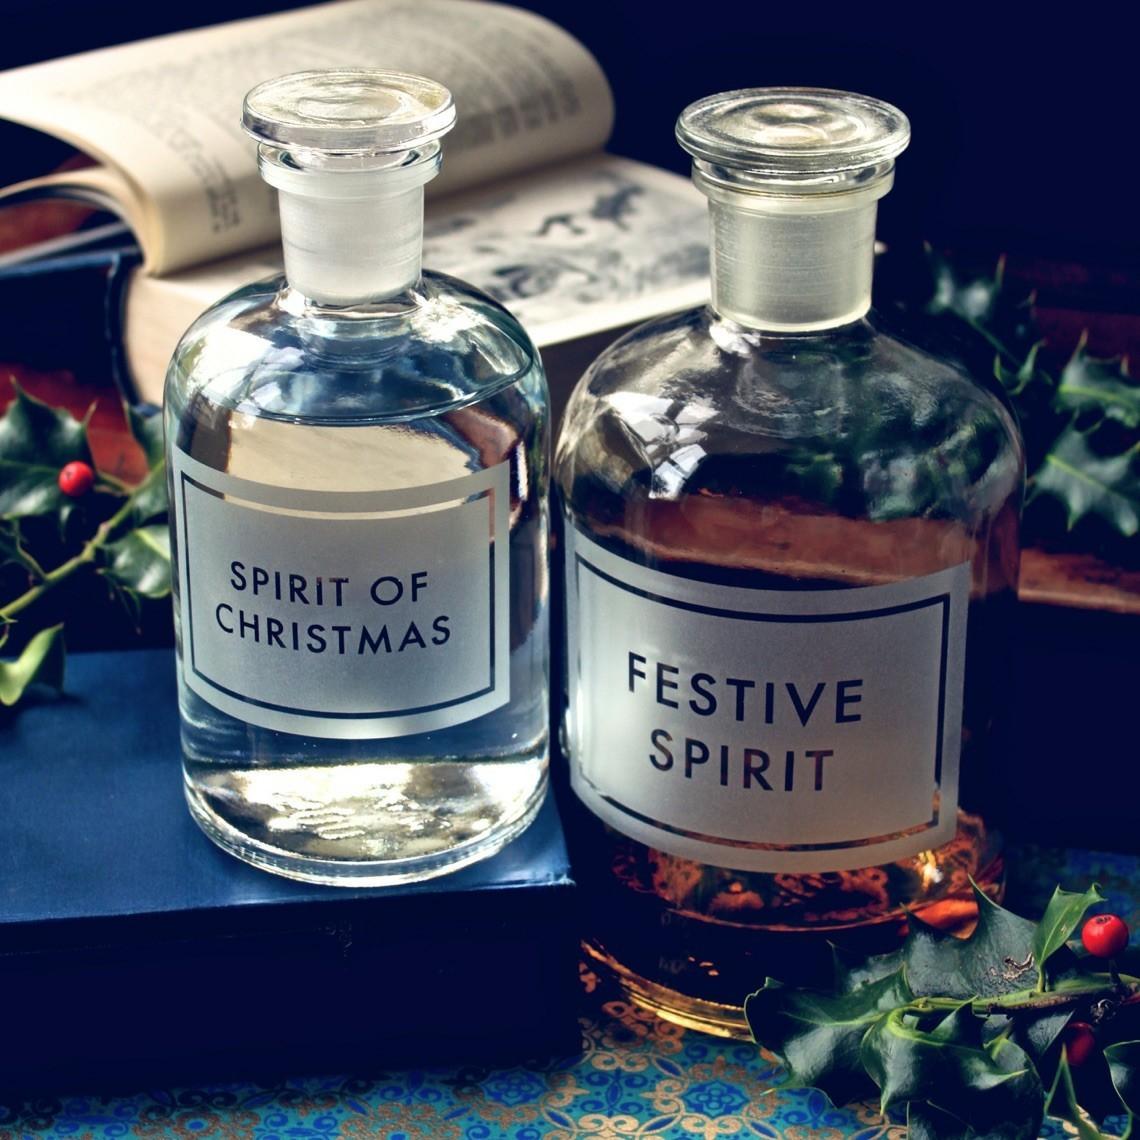 aesthetic, bottles, and spirit image